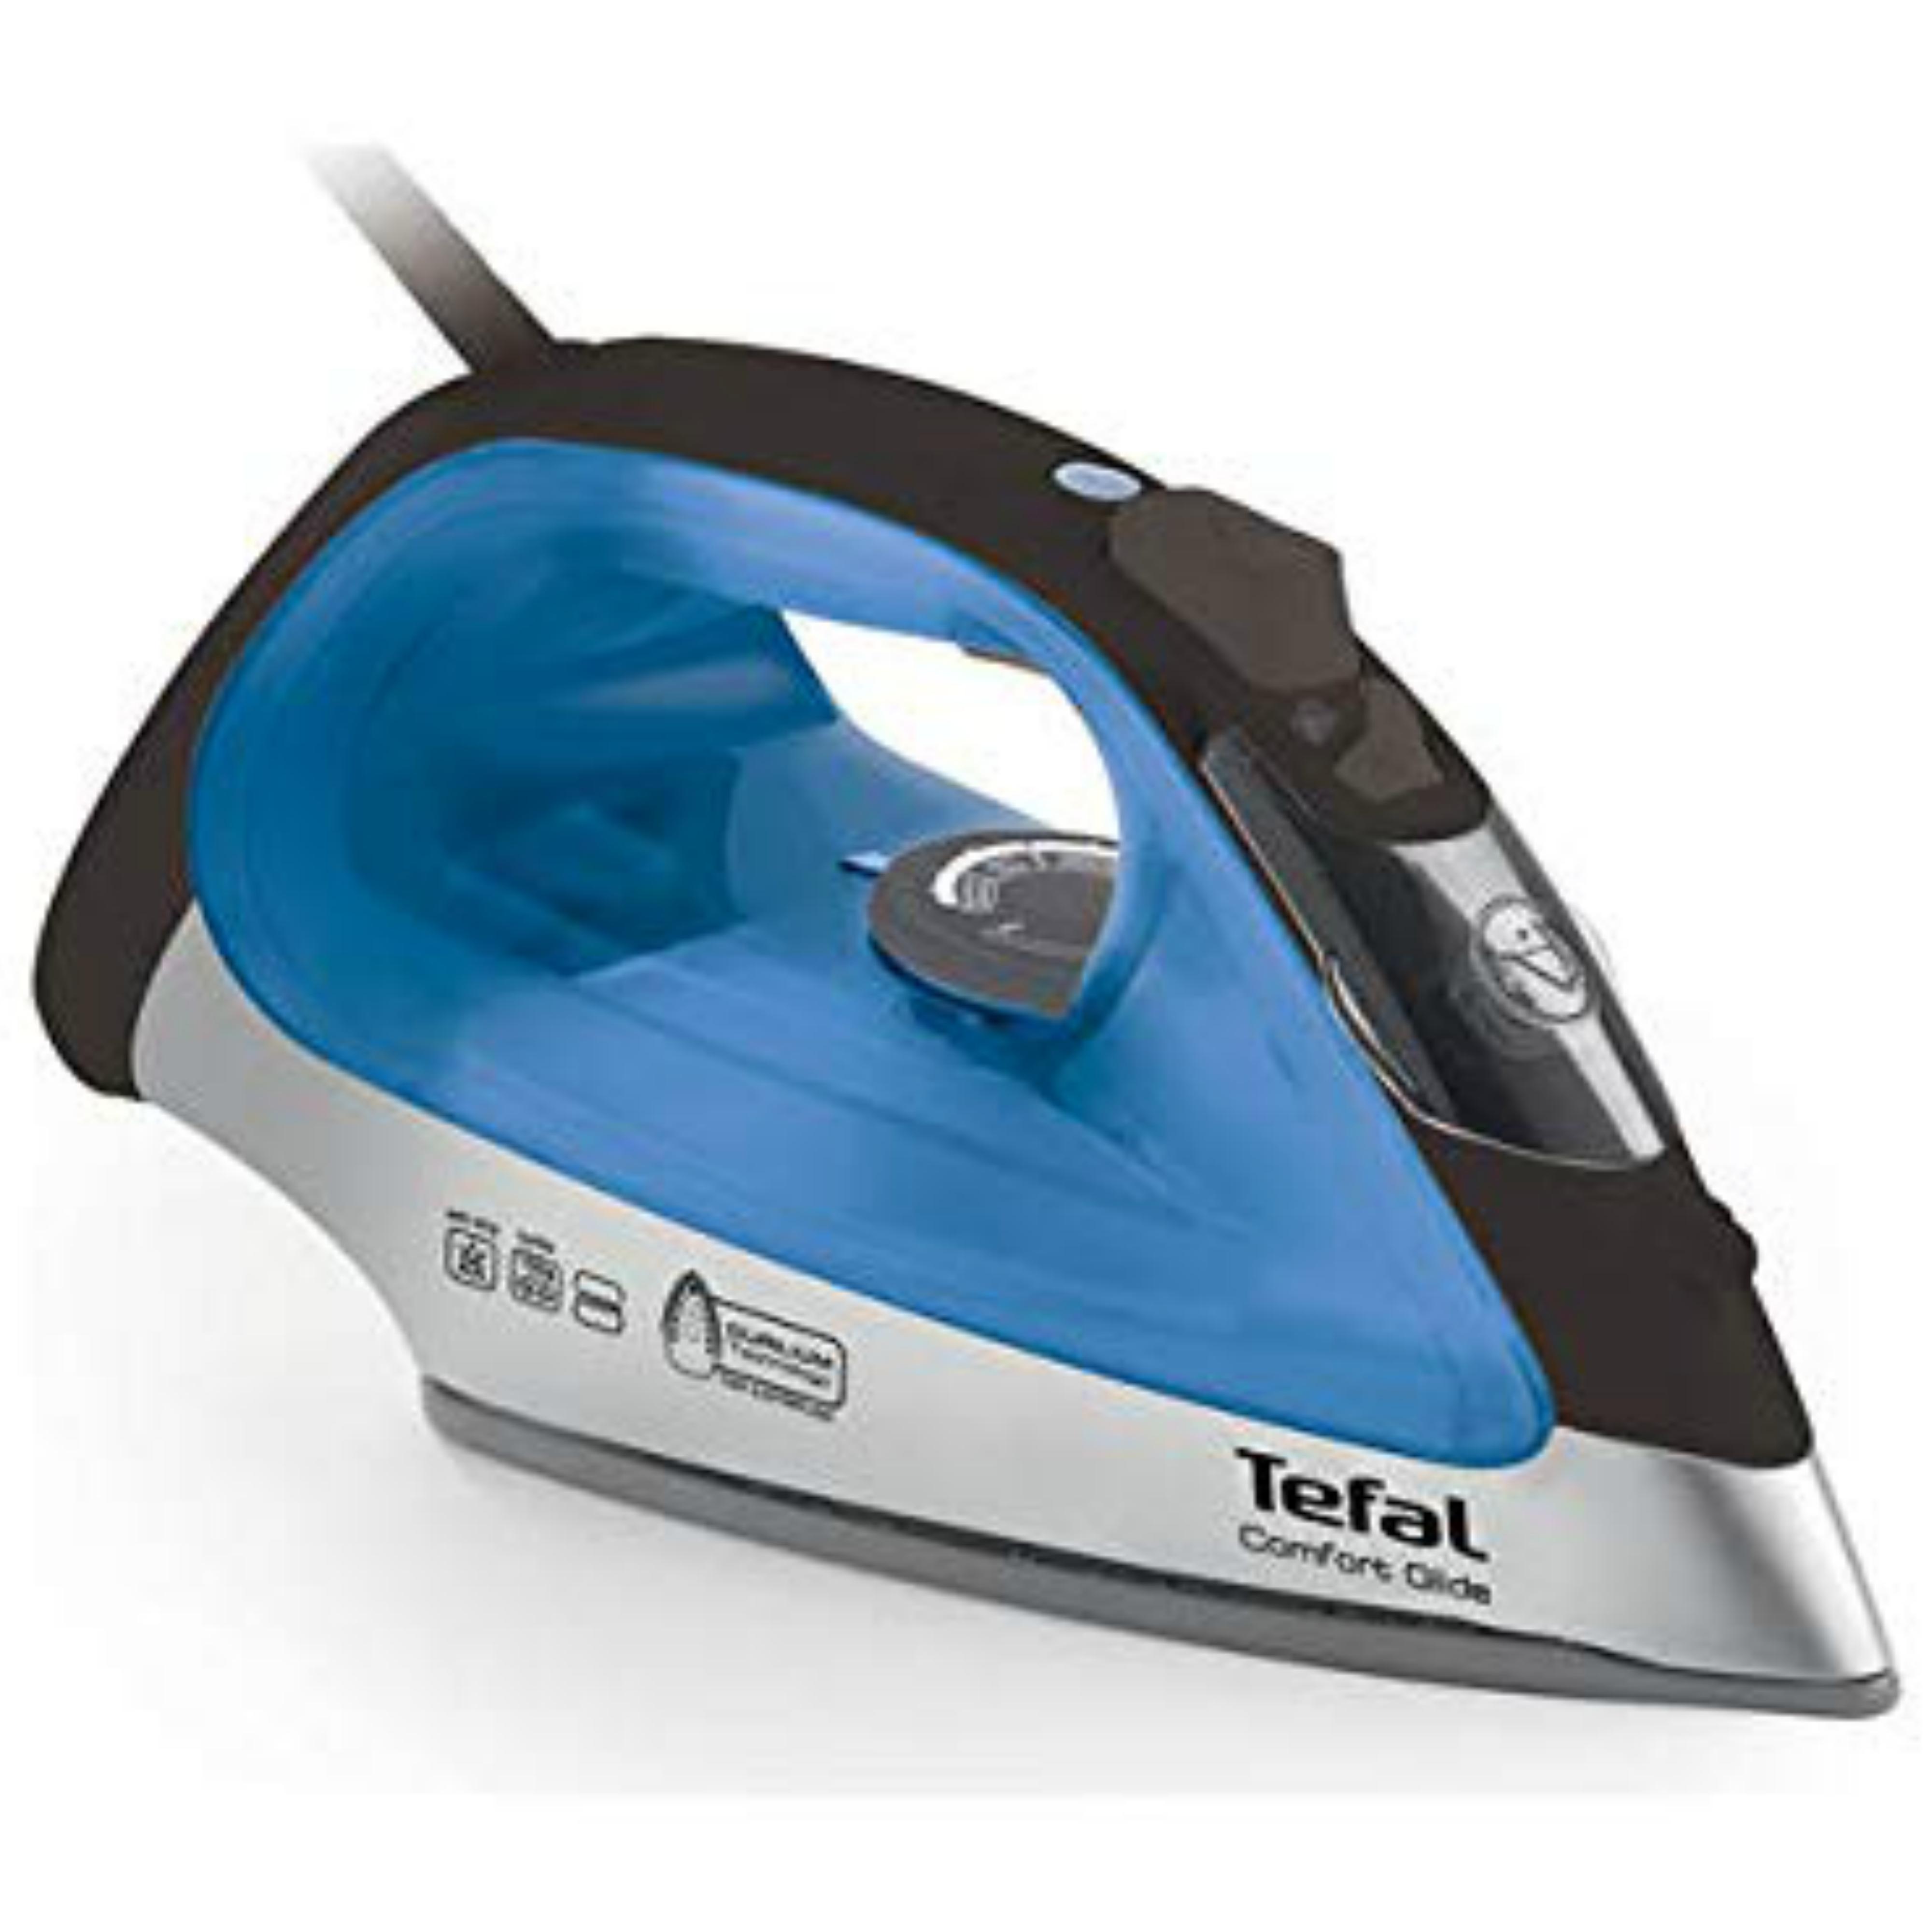 Tefal Ergonomic Ultraglide Steam Iron | Trigger Durilium Technology | 2500W | FV2677